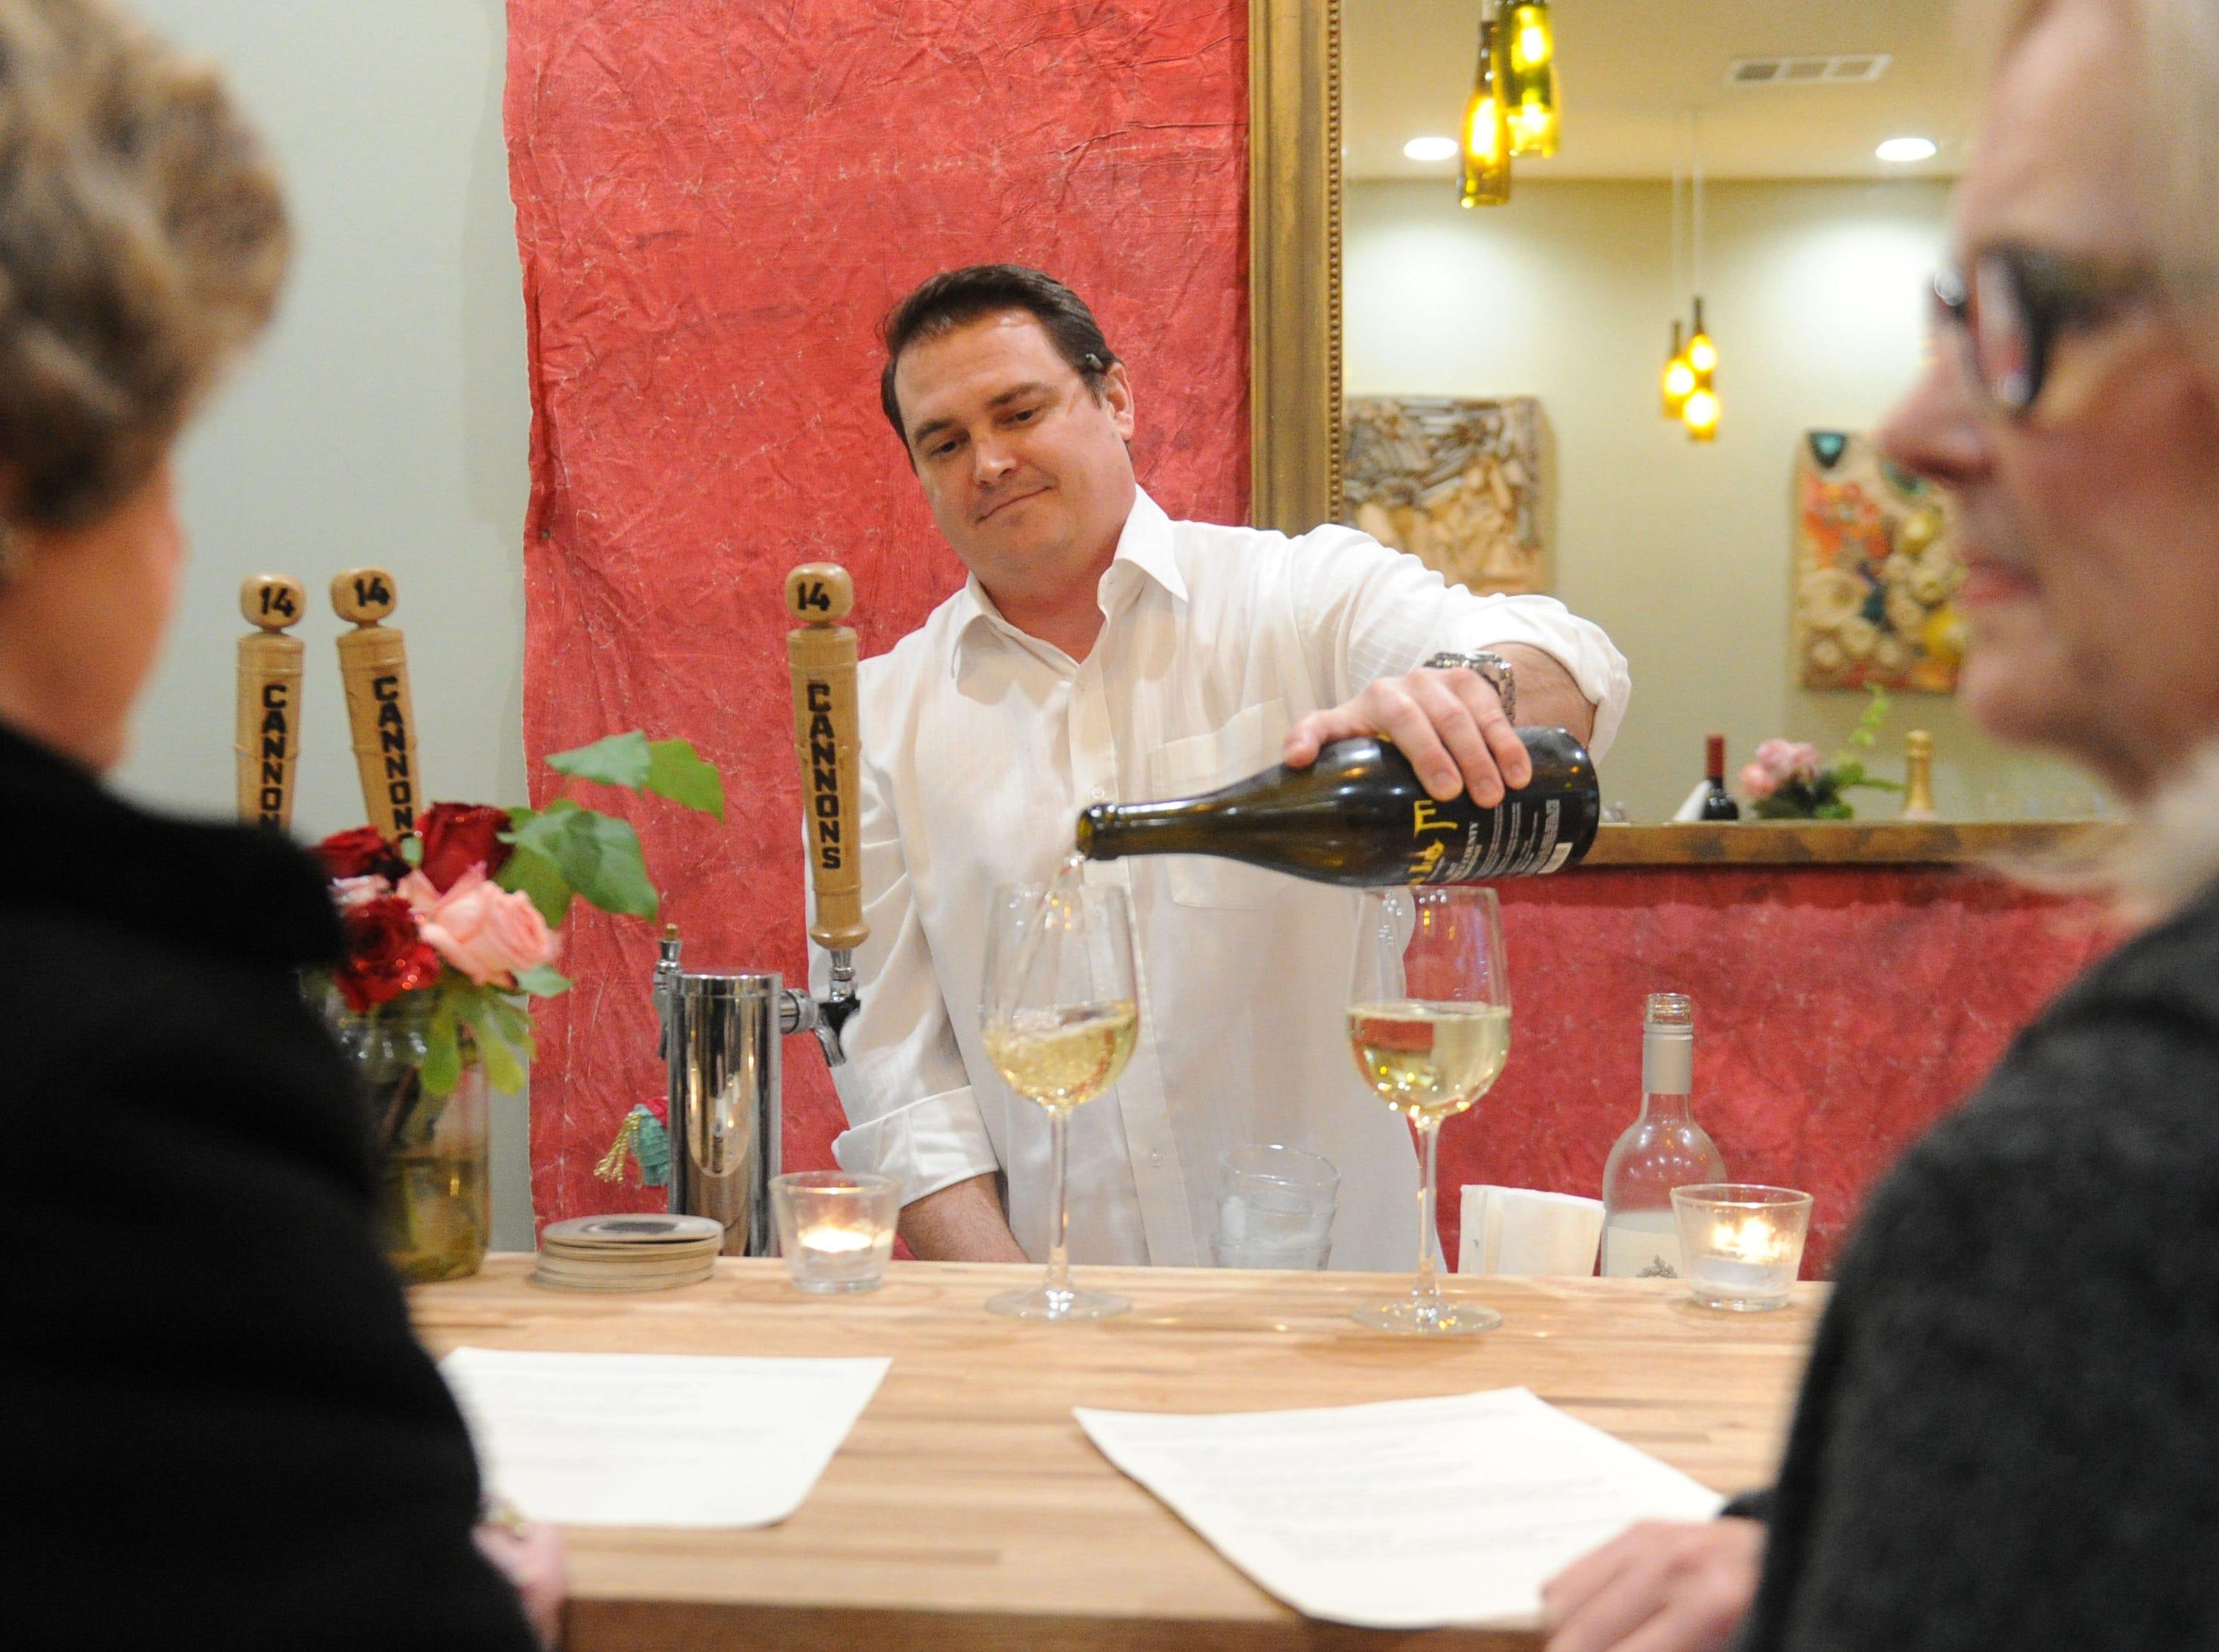 Graham Harris, owner of Decker Kitchen in Westlake Village, pours wine for guests Carole Gordon, left, and her friend Susan Bevan.